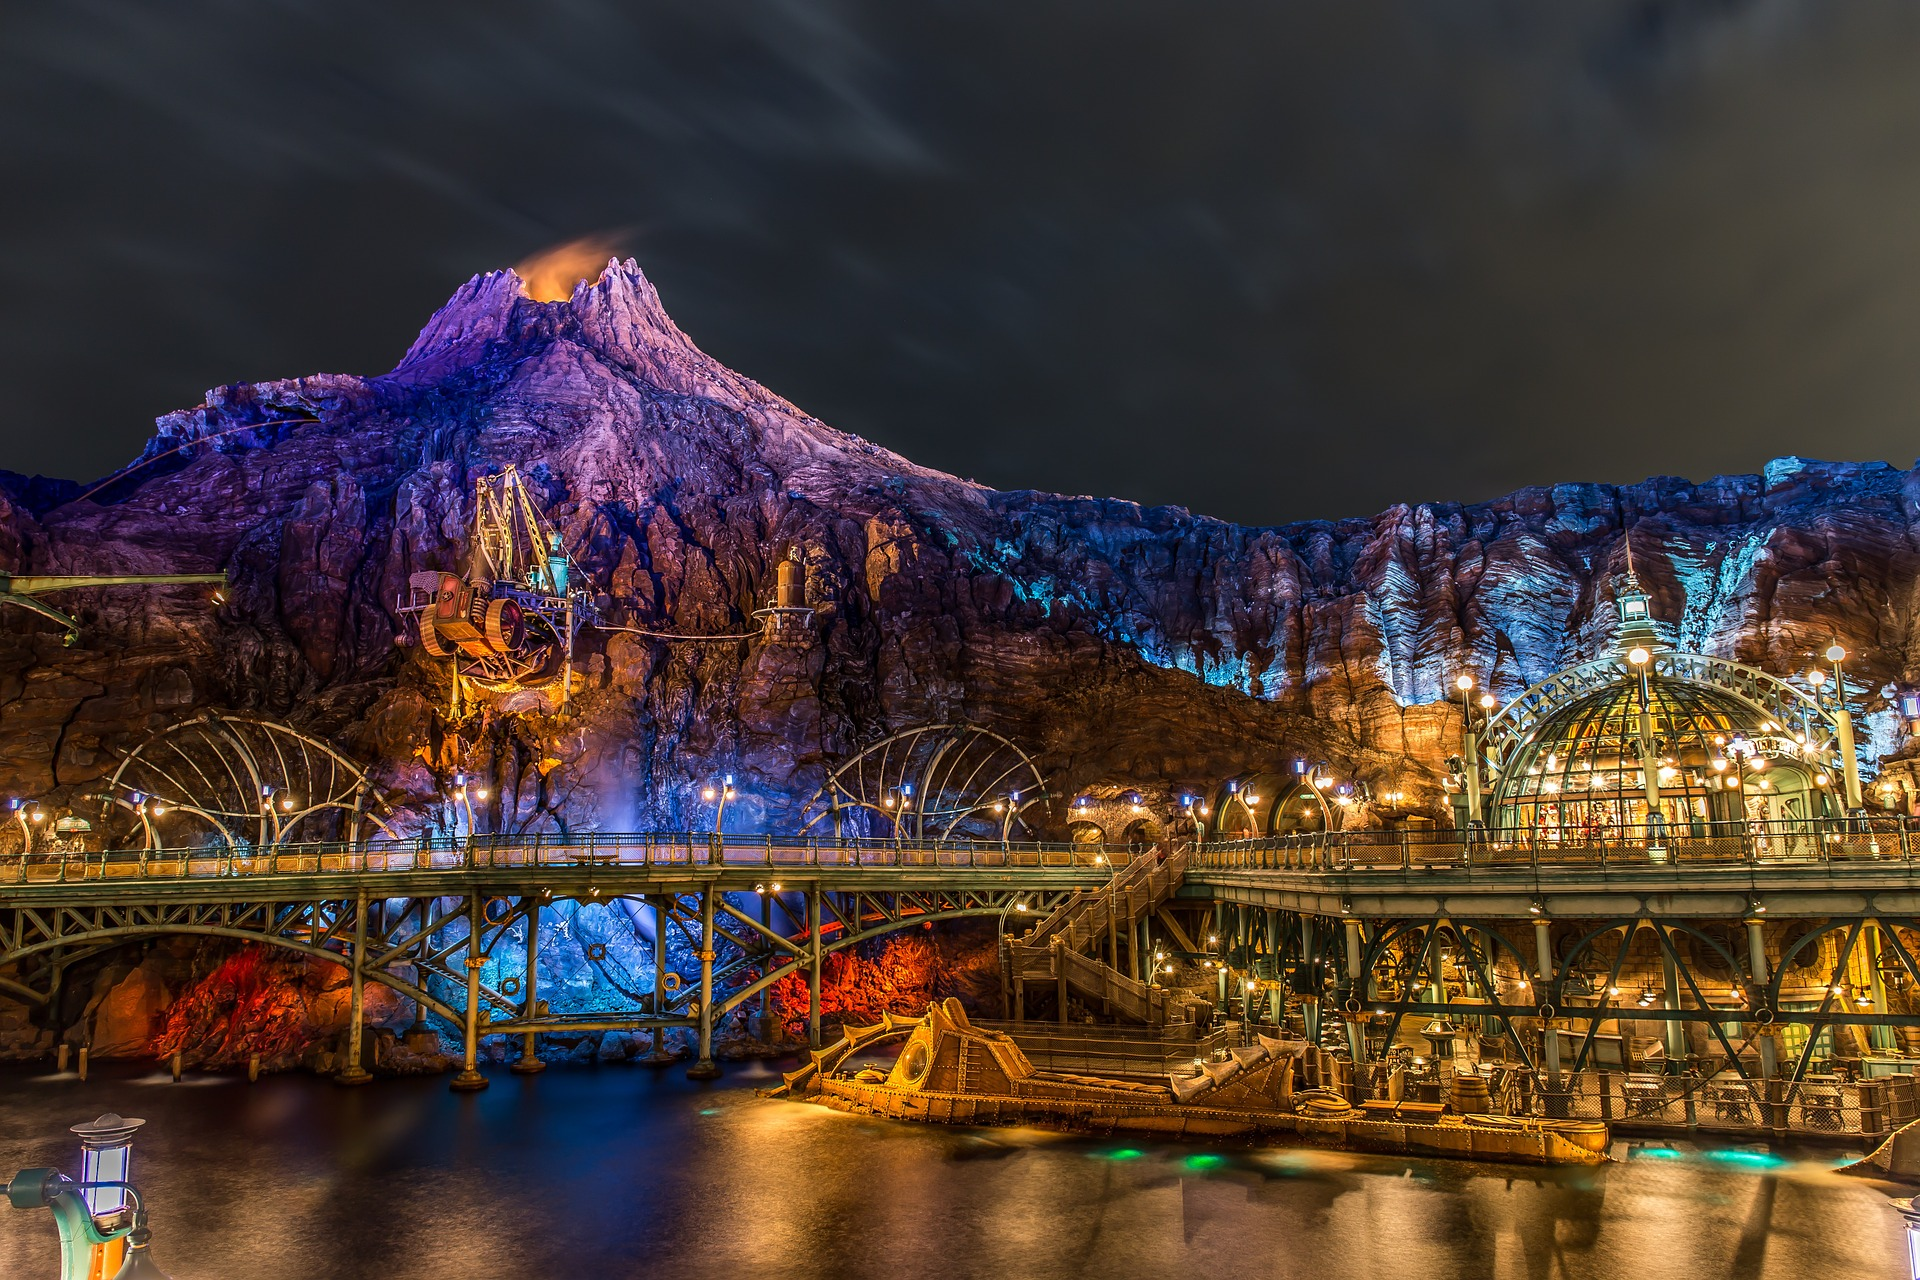 disney 1359226 1920 - Japan Theme Park Package